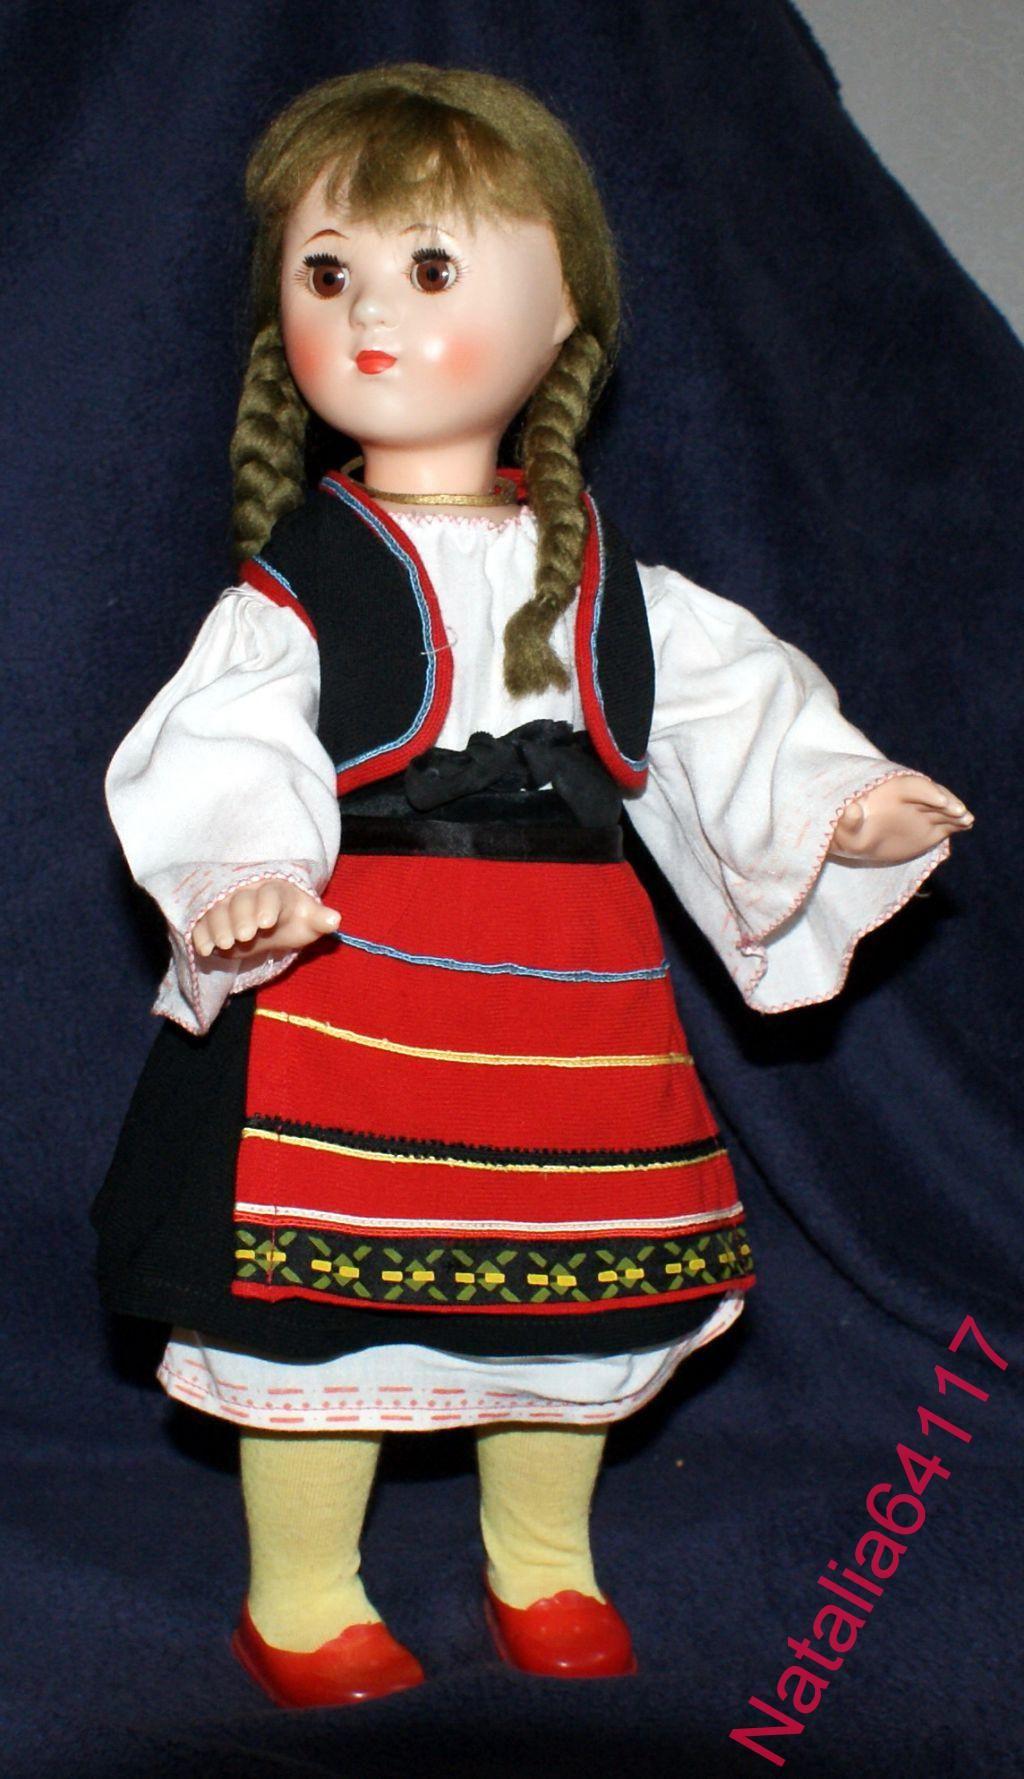 _Кукла_СССР_Болгарка_ф_ка_8_марта_Москва | Куклы, Москва и ...